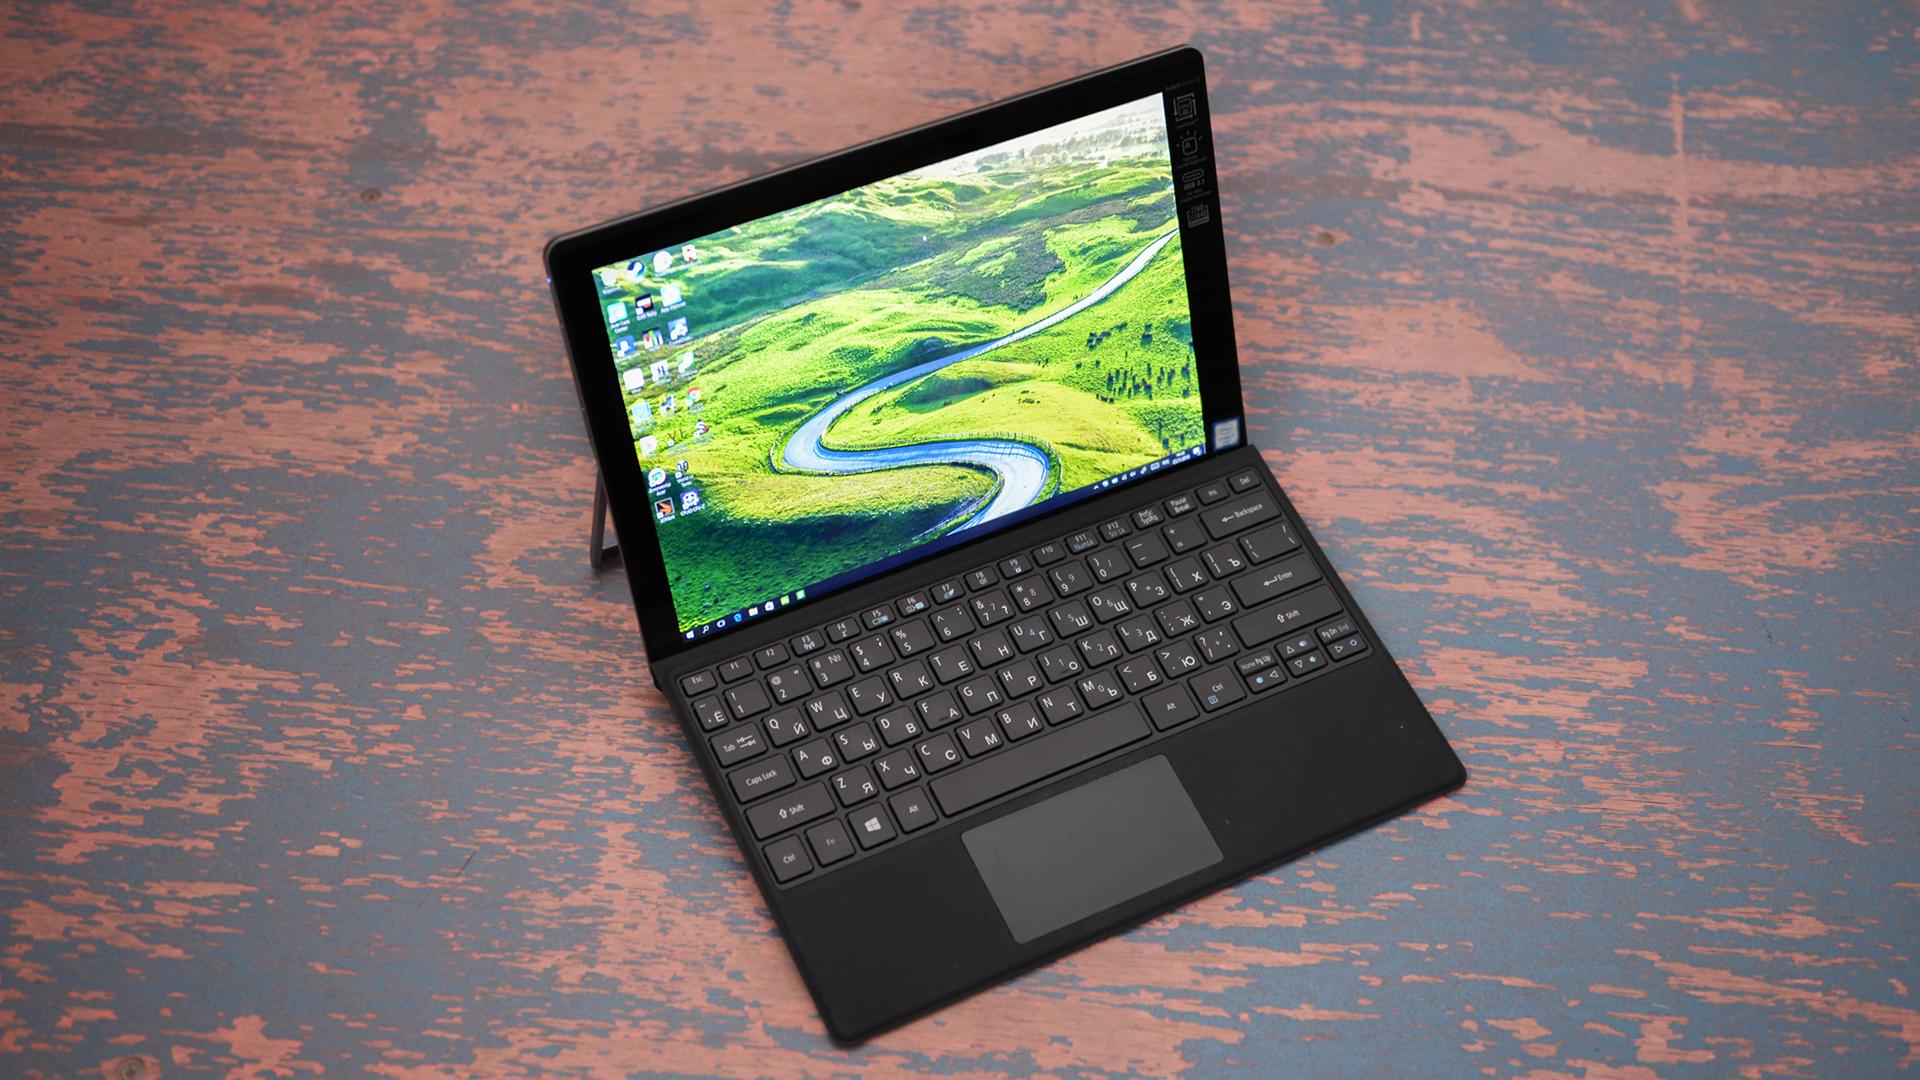 Acer S273HLbmii Specs  CNET